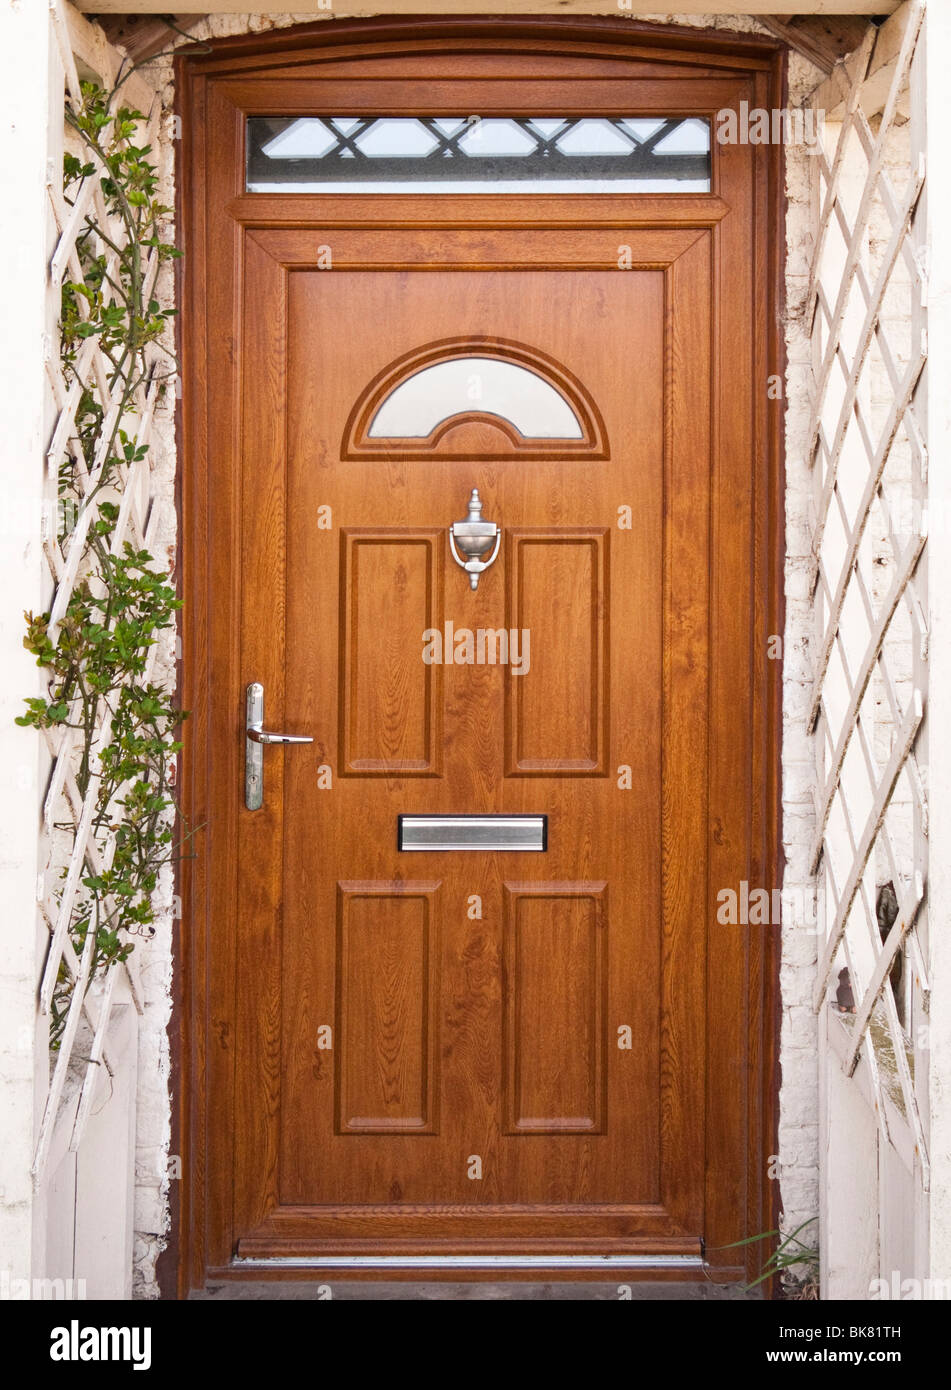 Front door trellis fypon pvc trellis systems buildipedia for Fypon pvc trellis system